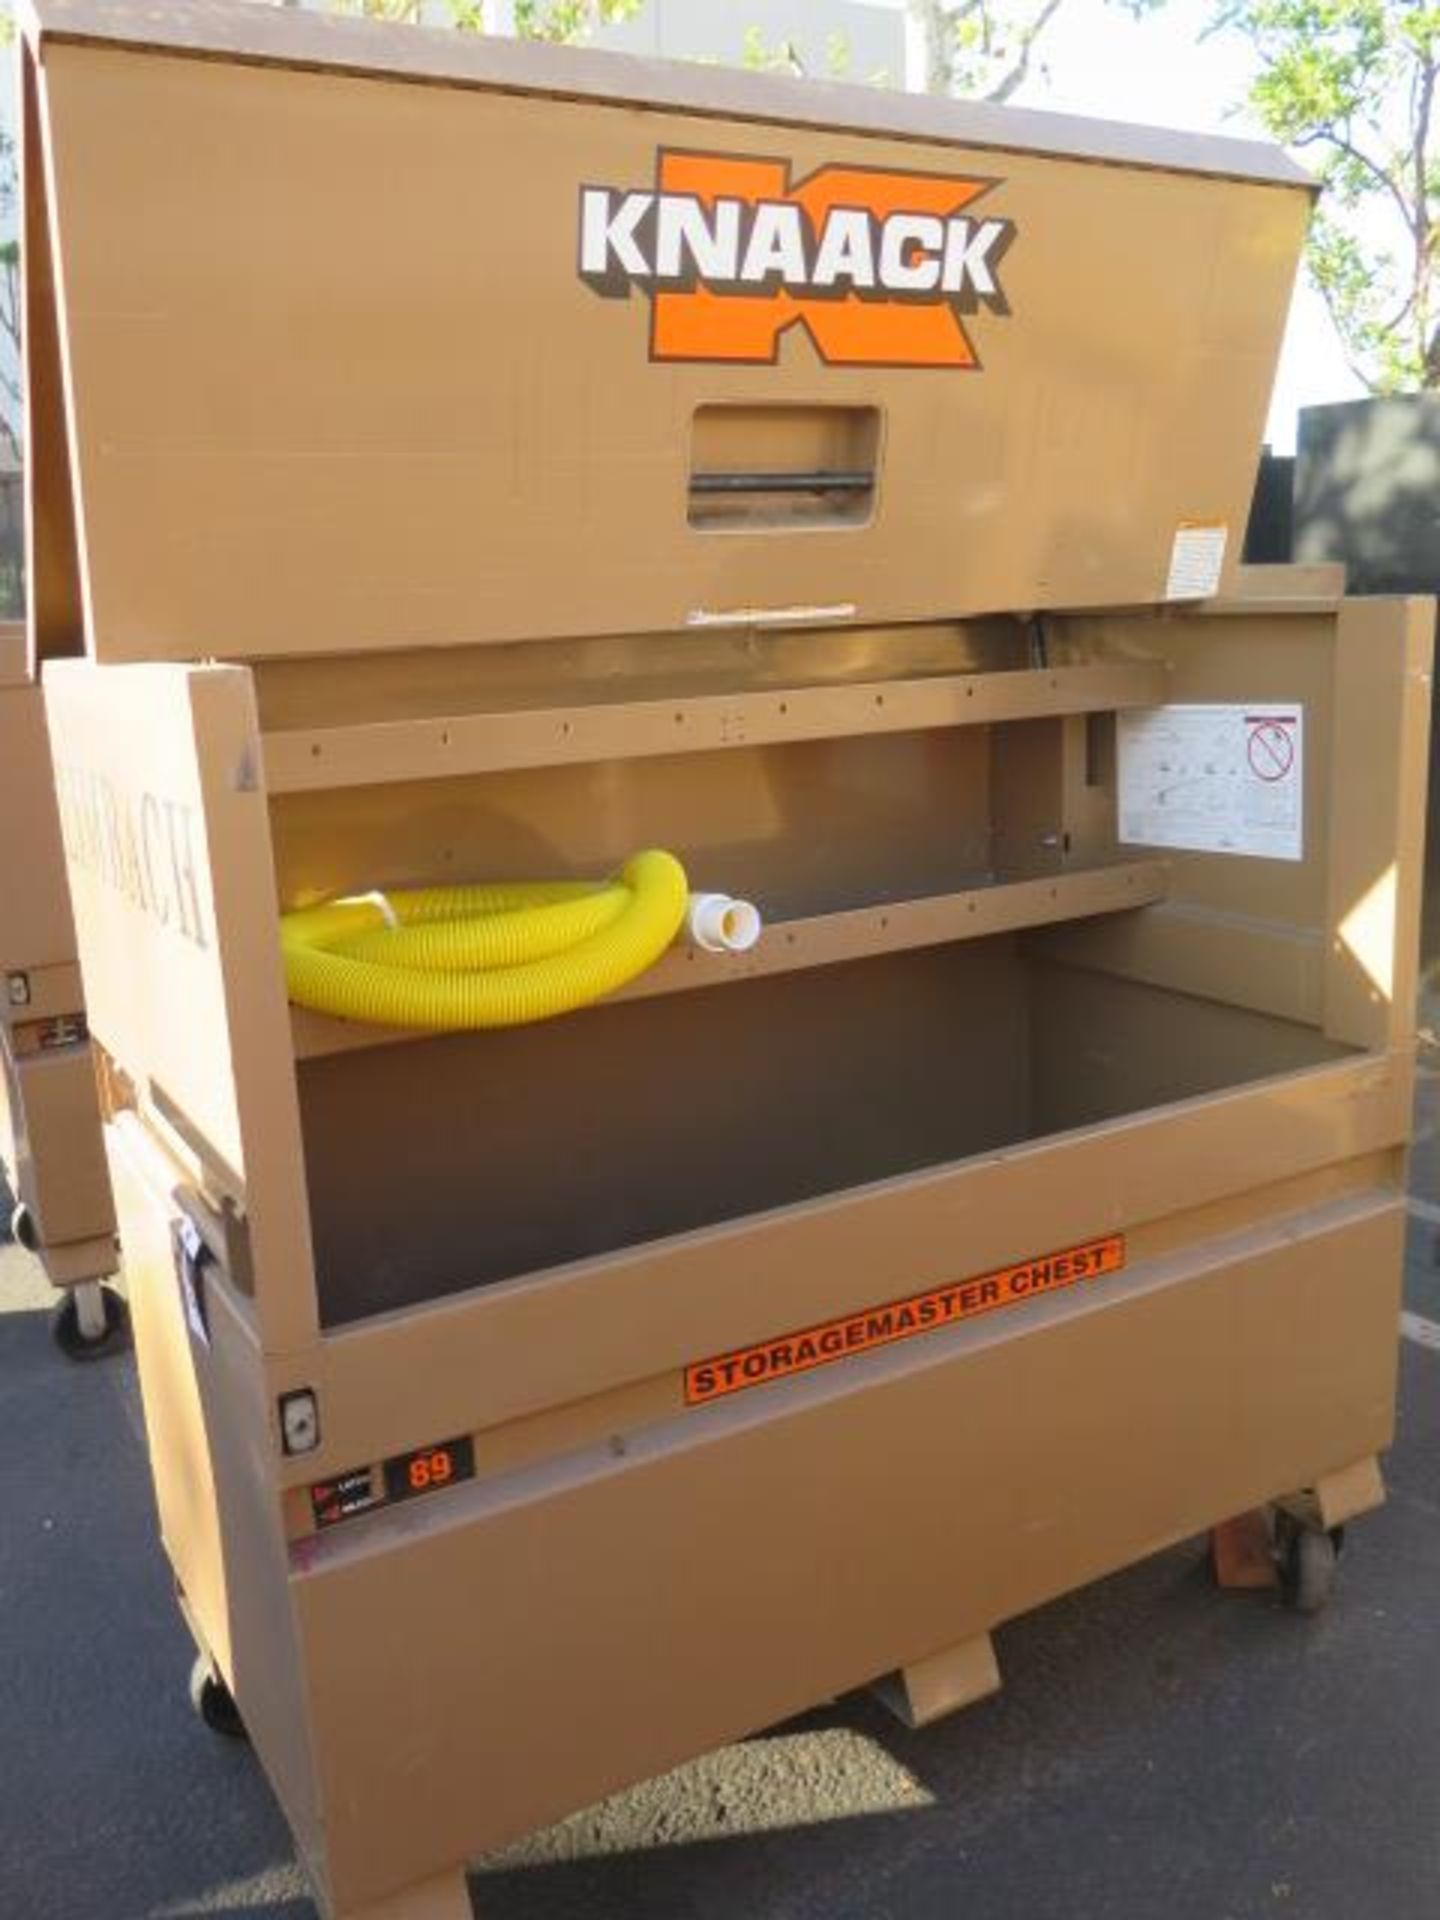 Knaack mdl. 89 Storagemaster Rolling Job Box (SOLD AS-IS - NO WARRANTY) - Image 4 of 9